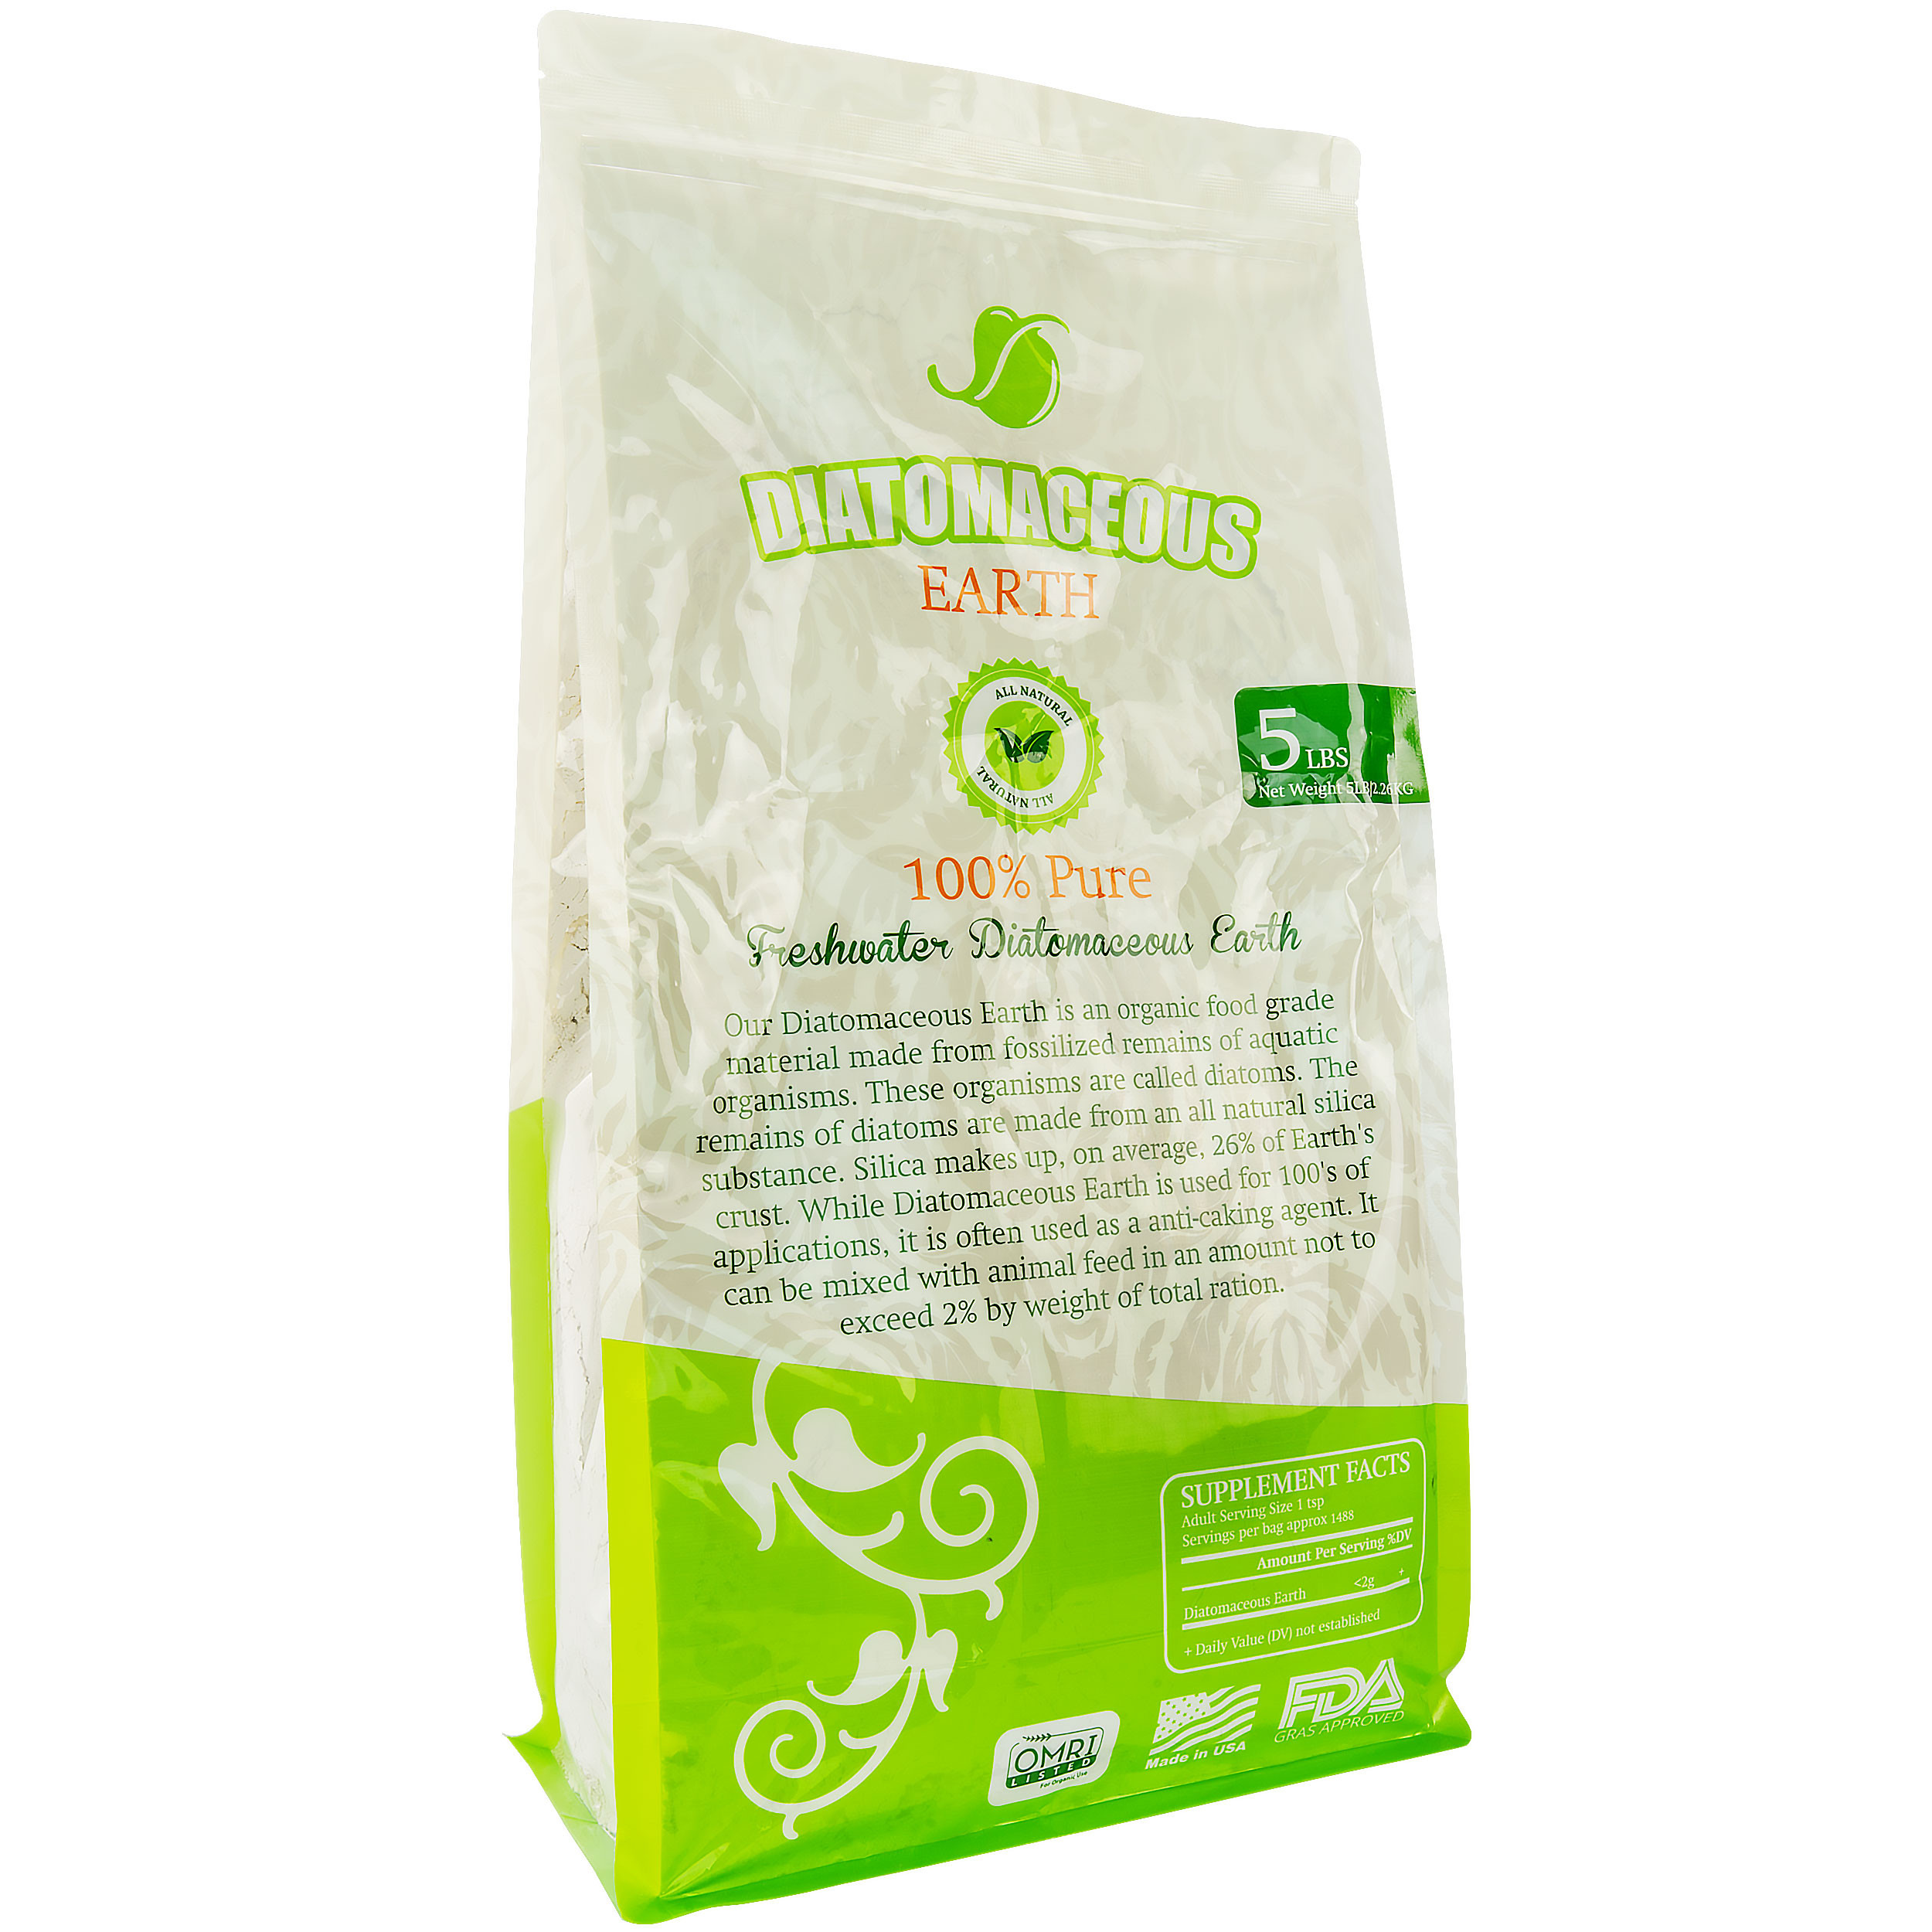 Diatomaceous Earth Food Grade 100% Pure